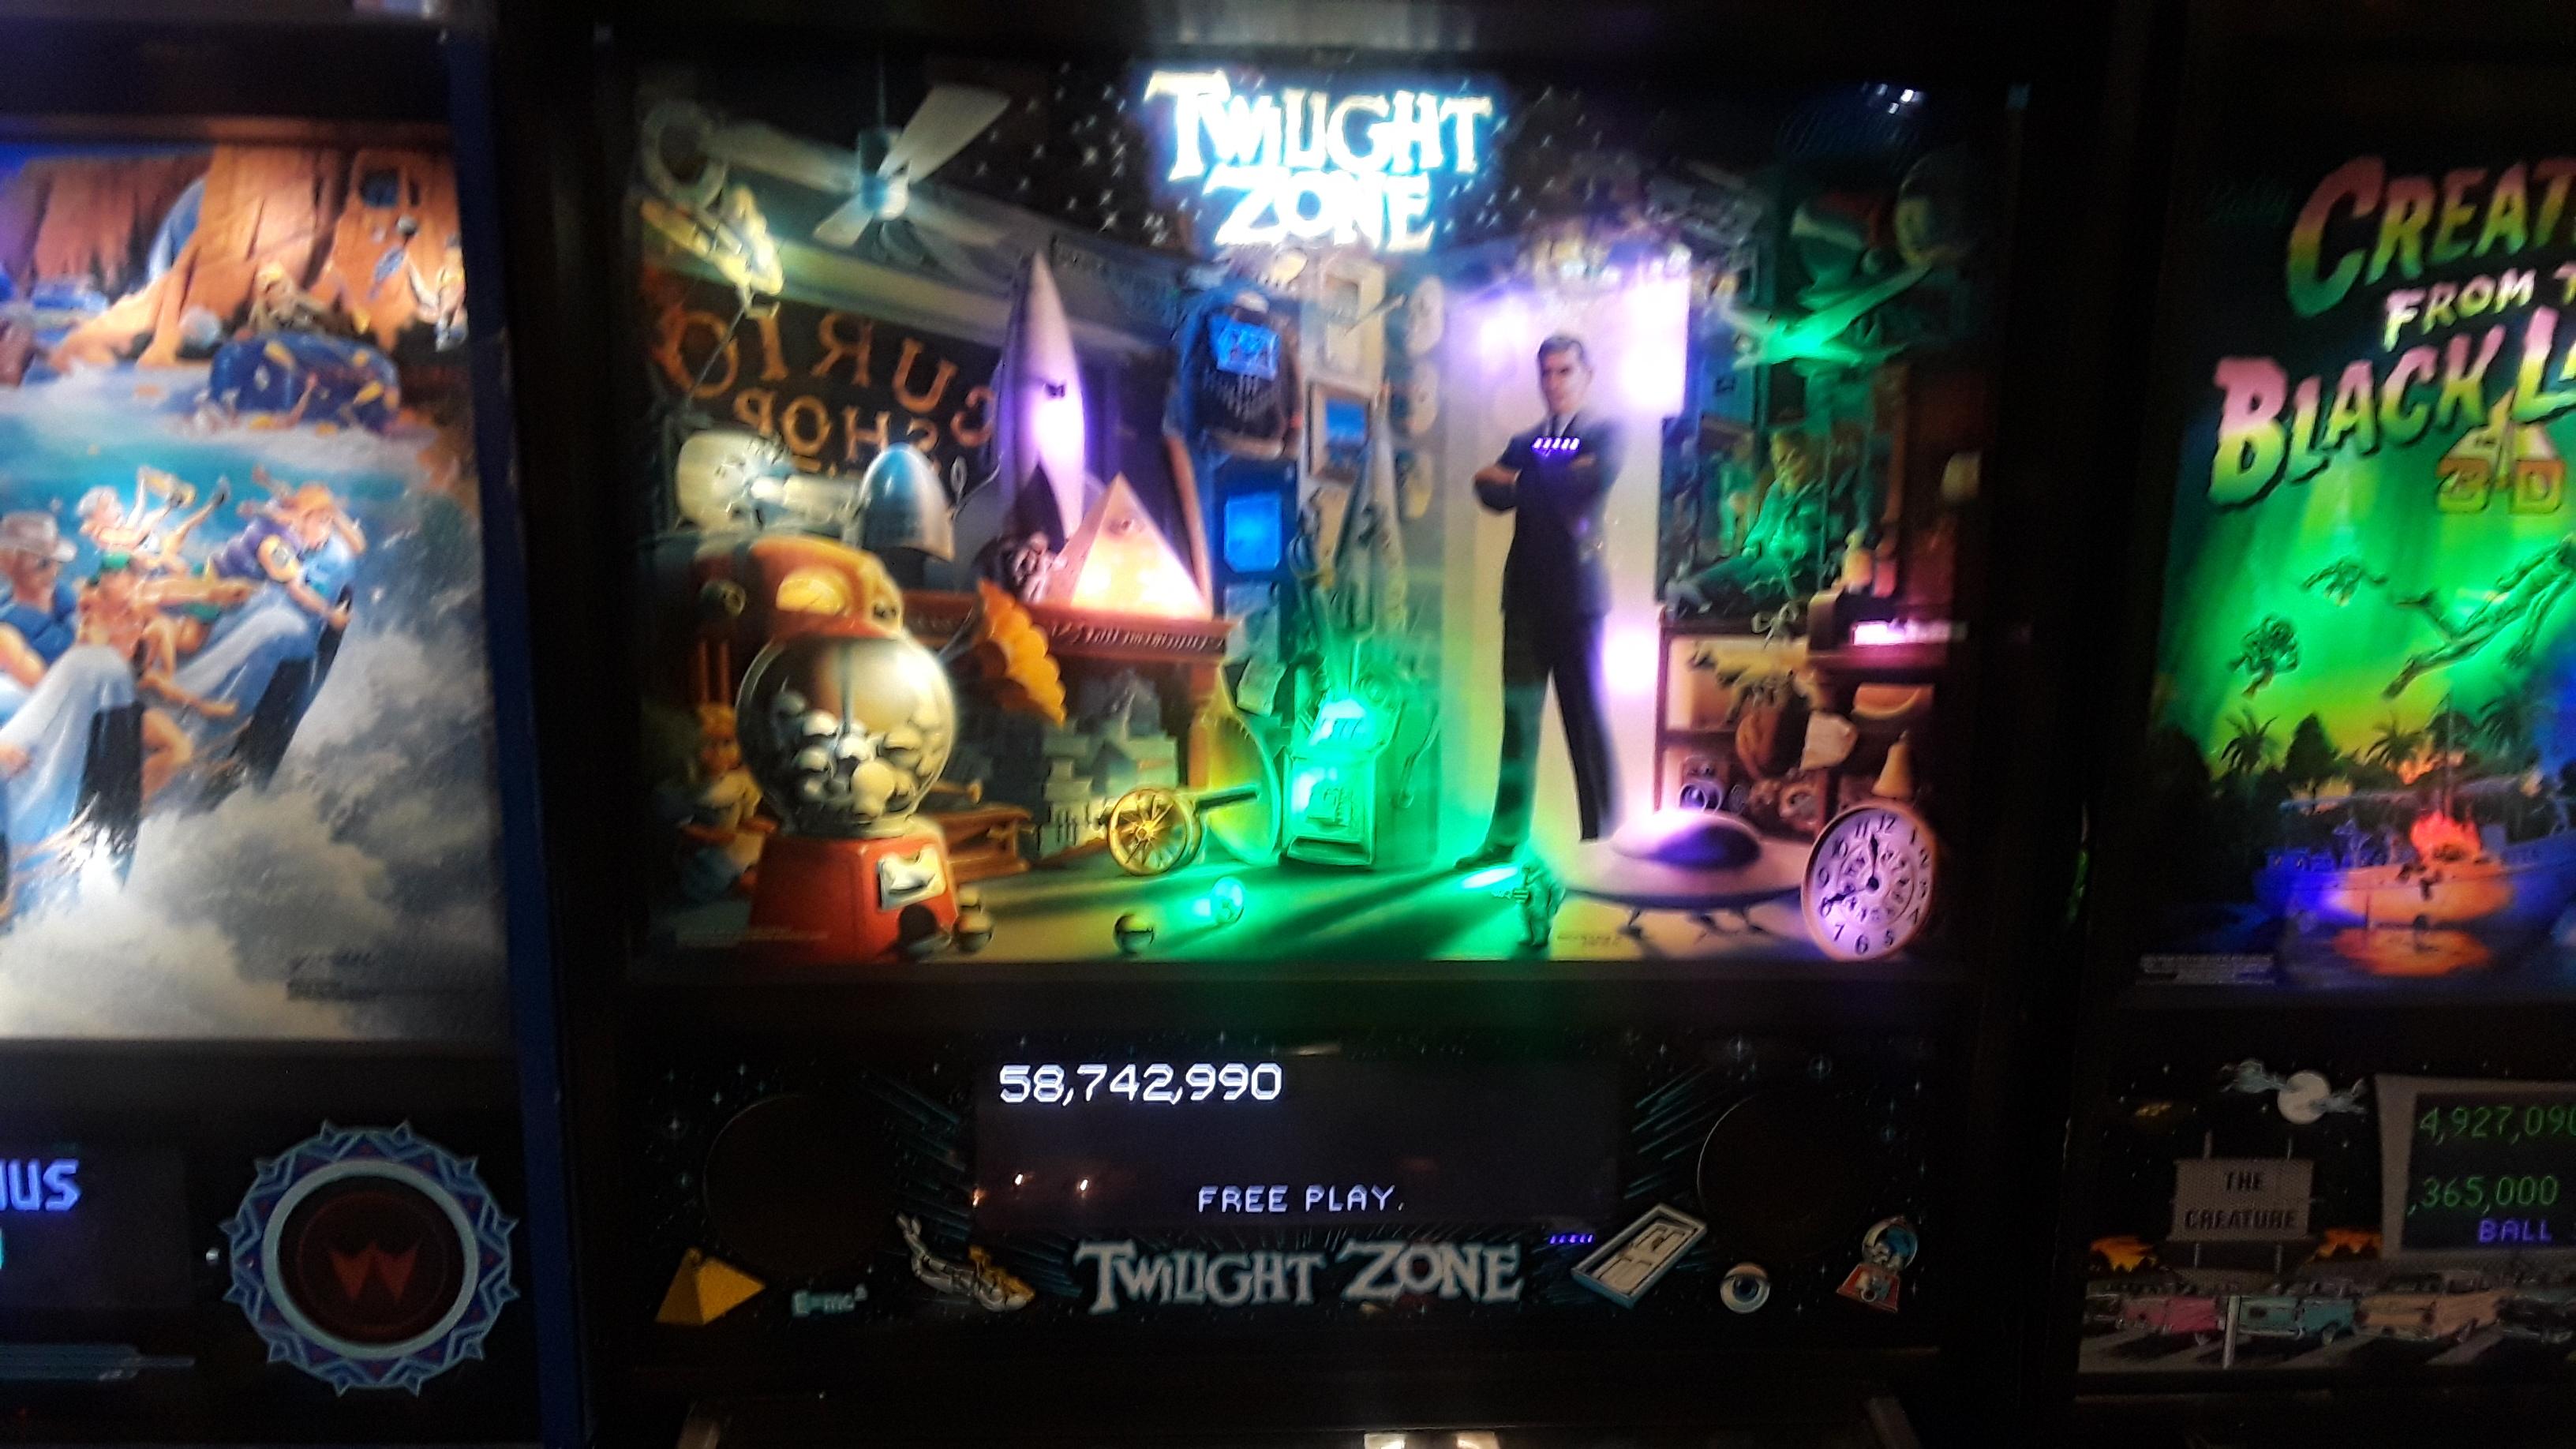 JML101582: Twilight Zone (Pinball: 3 Balls) 58,742,990 points on 2019-11-23 20:07:39